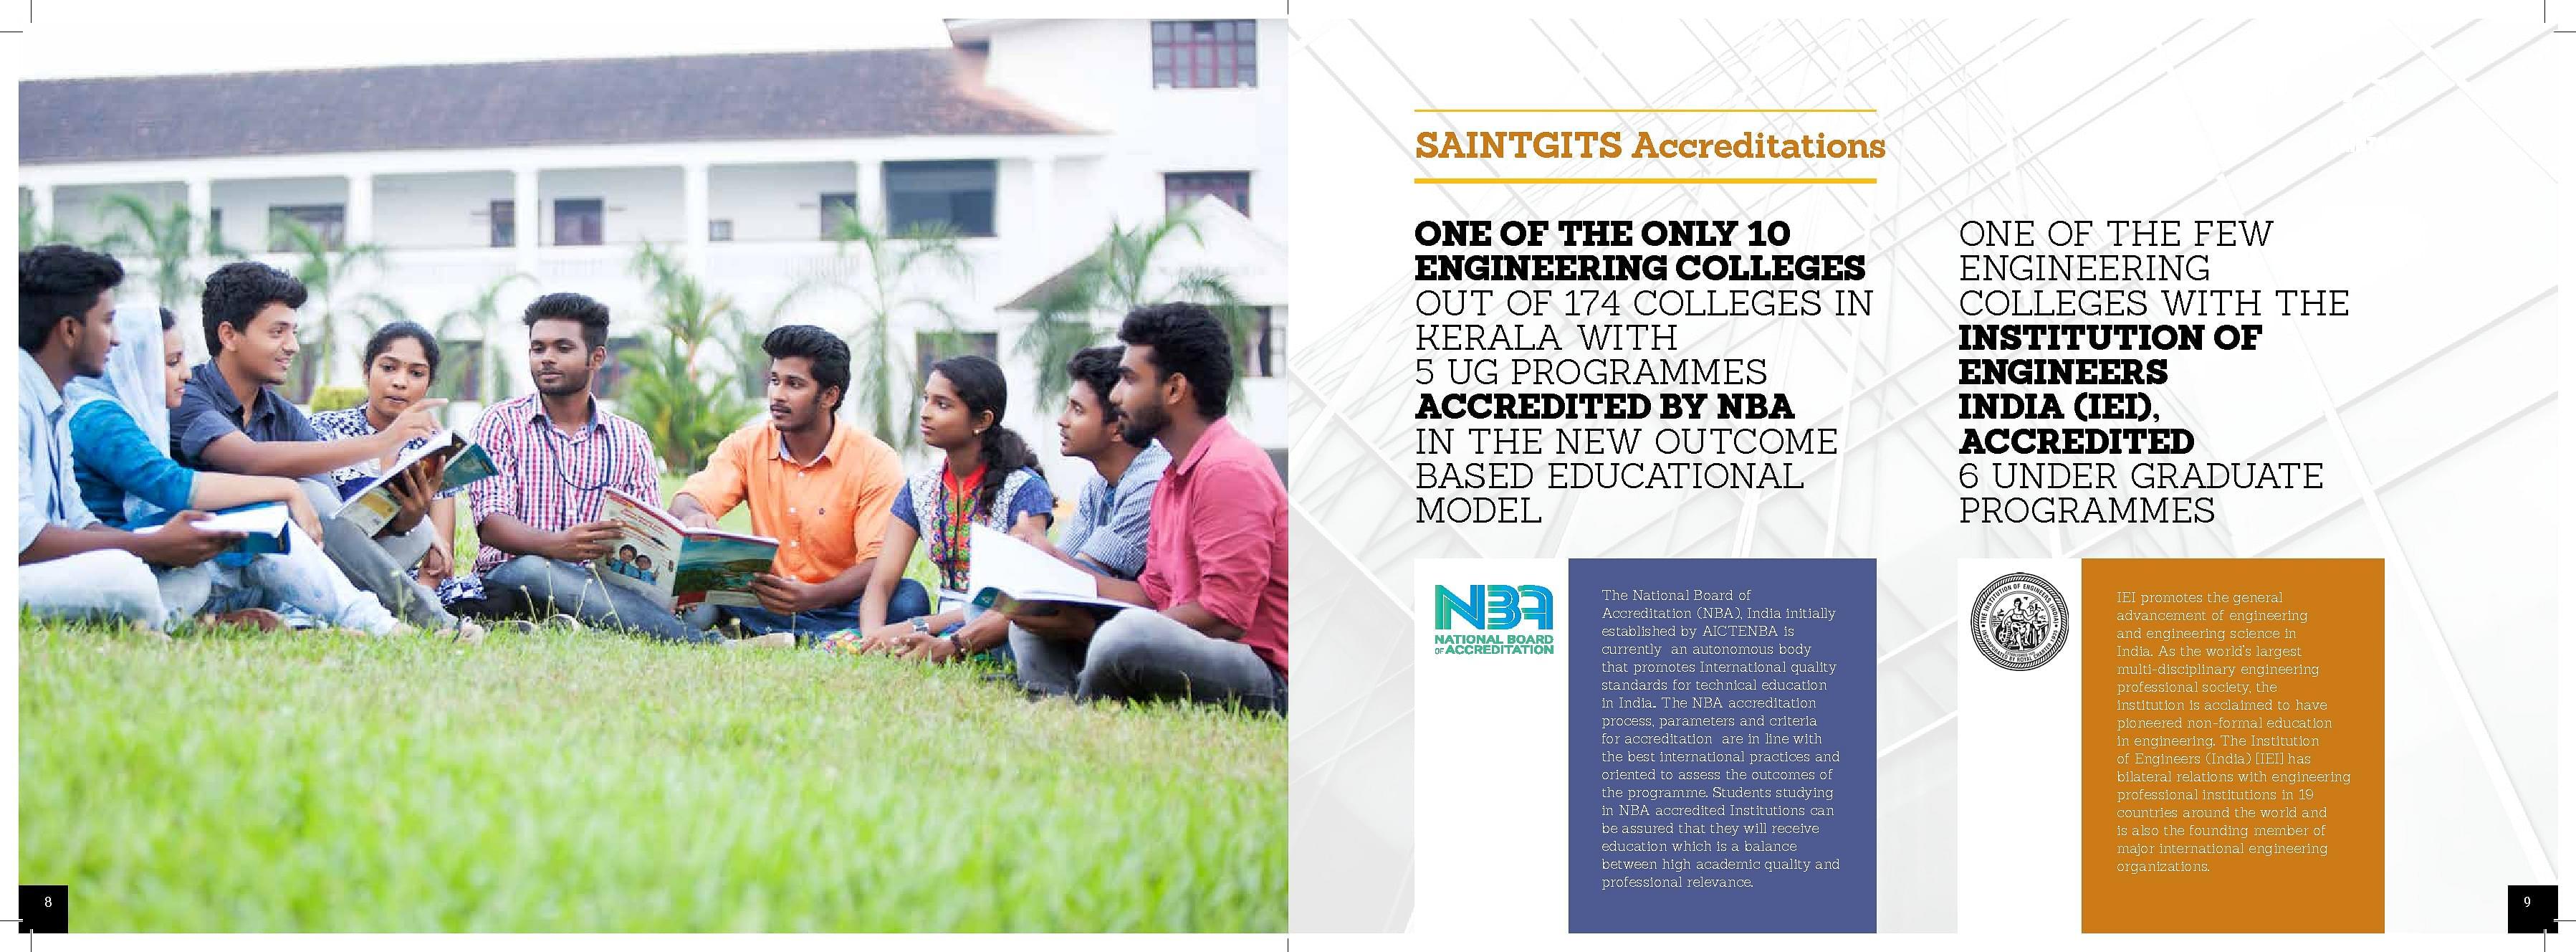 Saintgits College of Engineering, Kottayam - Admissions